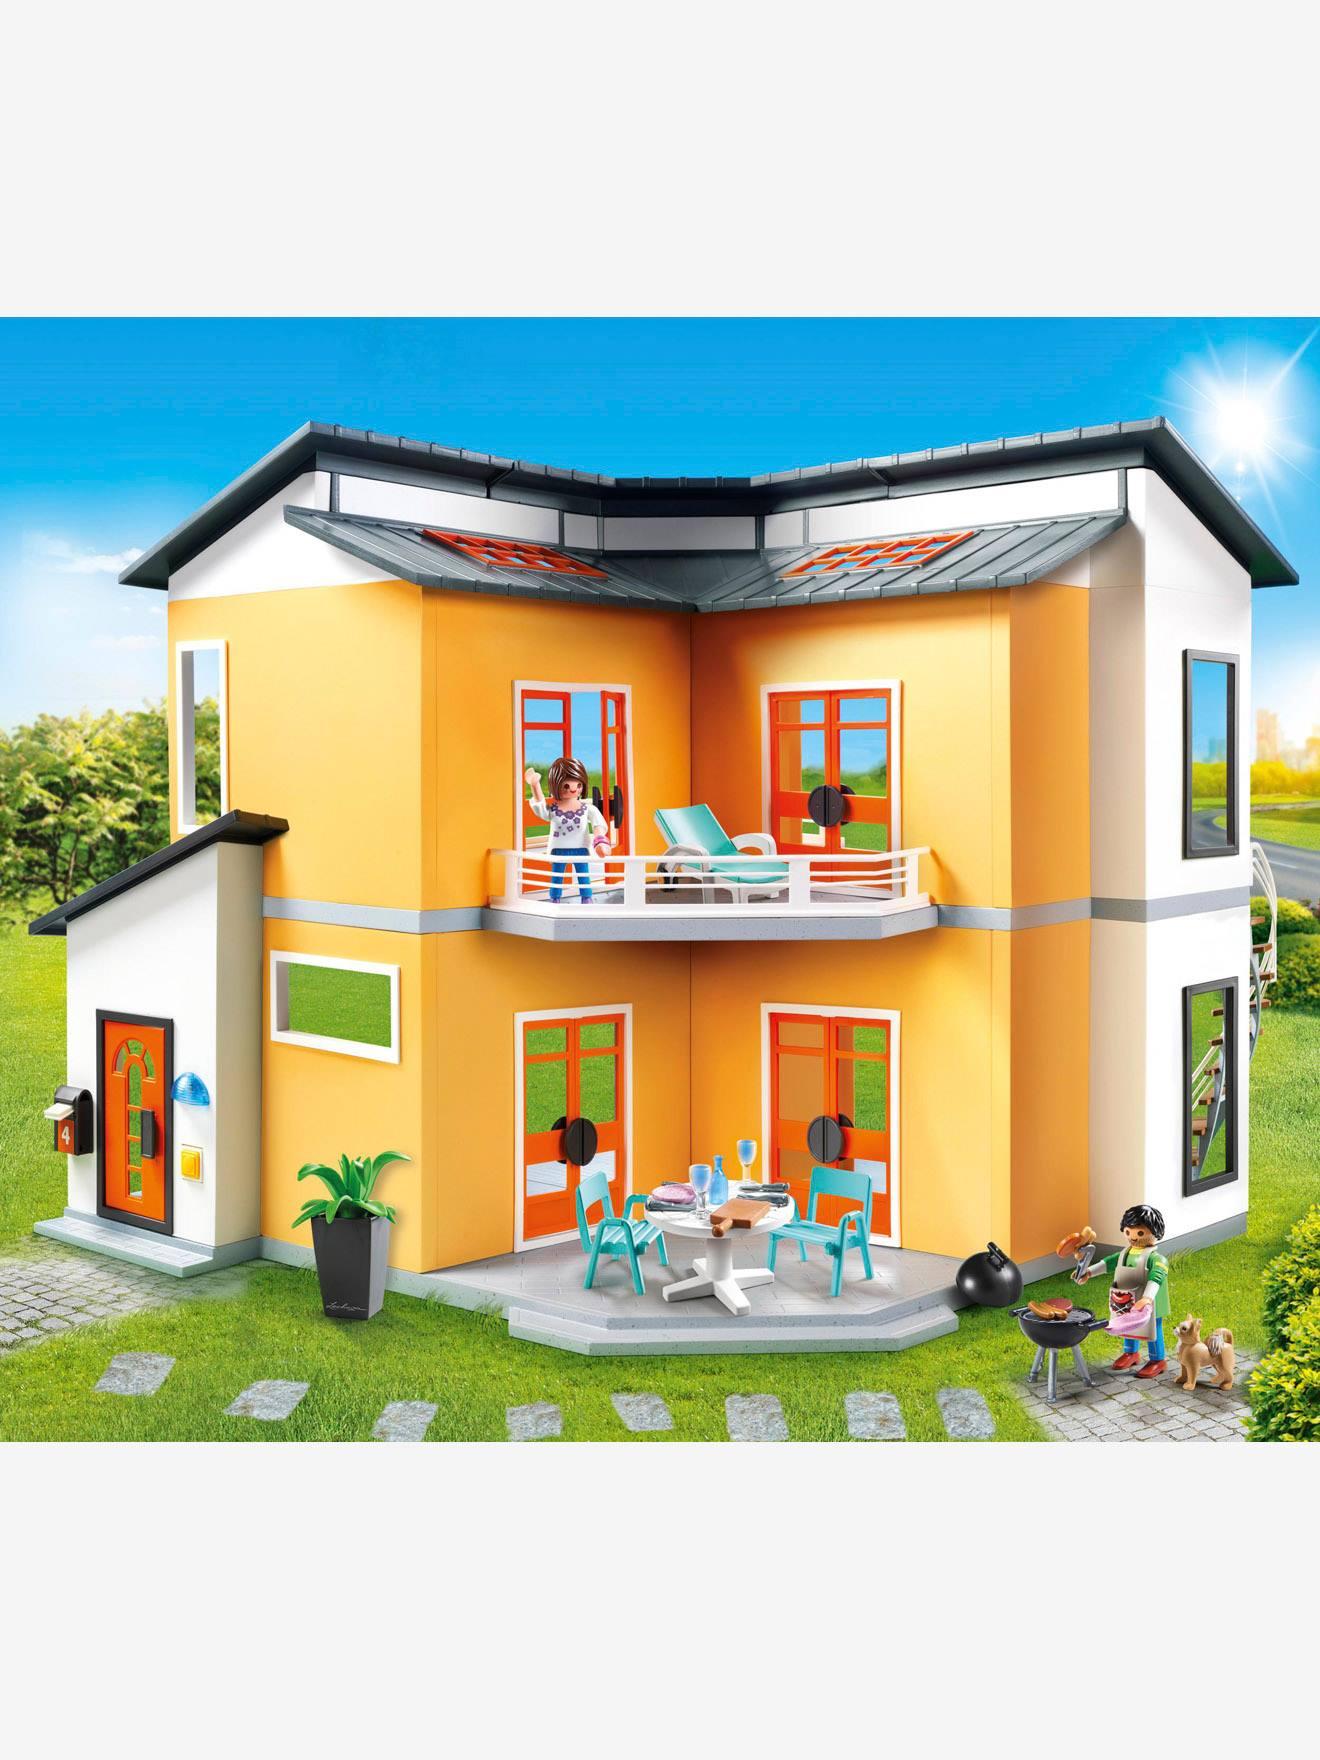 9266 Maison moderne Playmobil orange - Playmobil